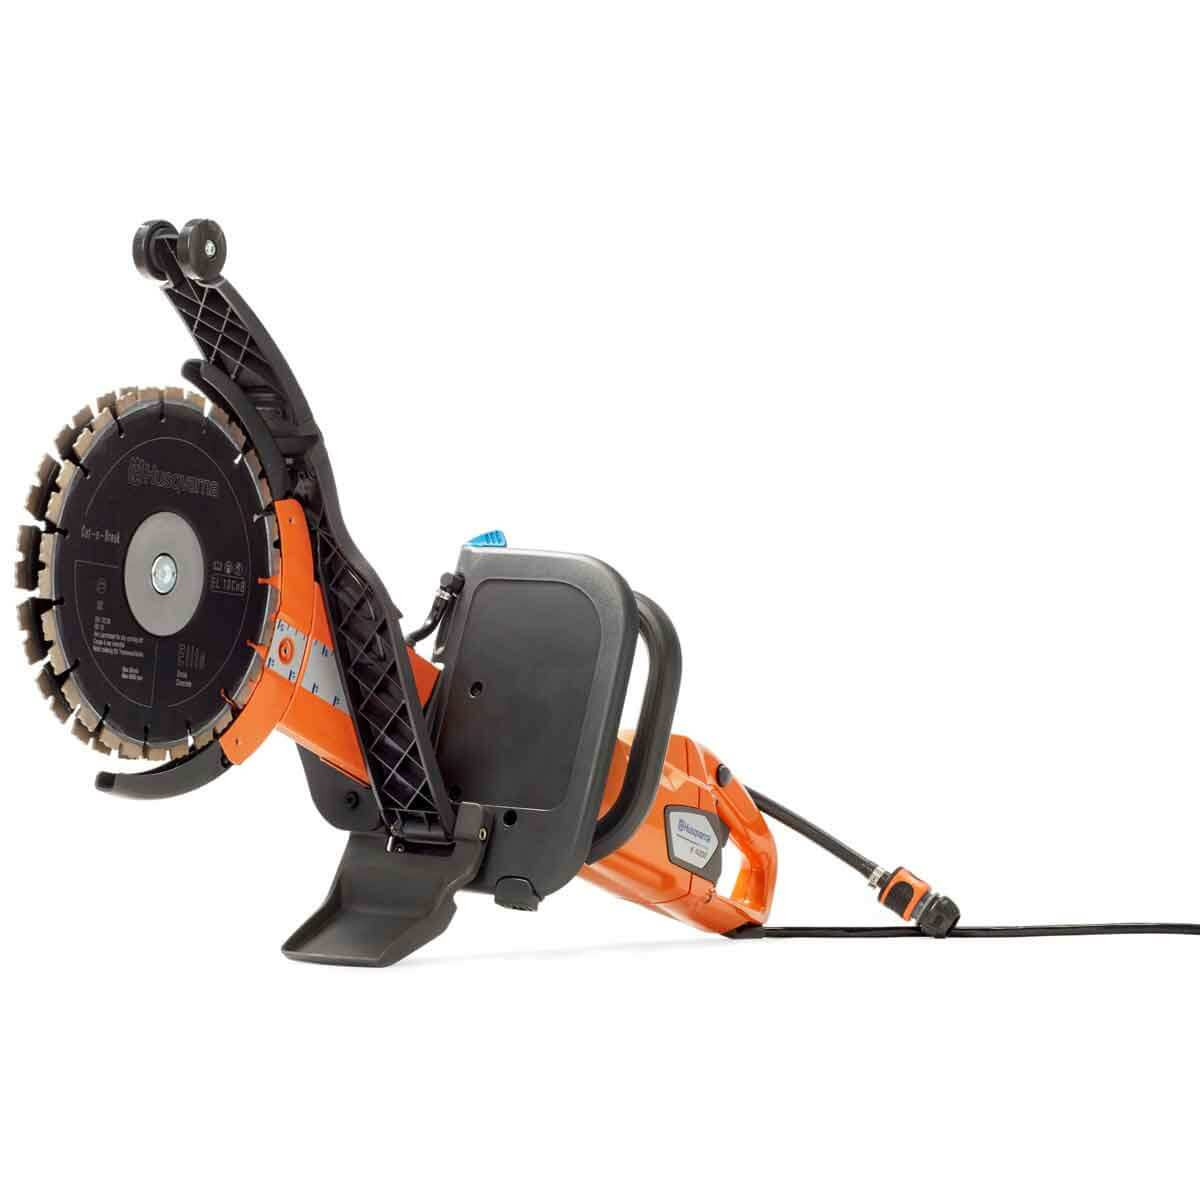 K3000 Electric Cut-n-Break saw